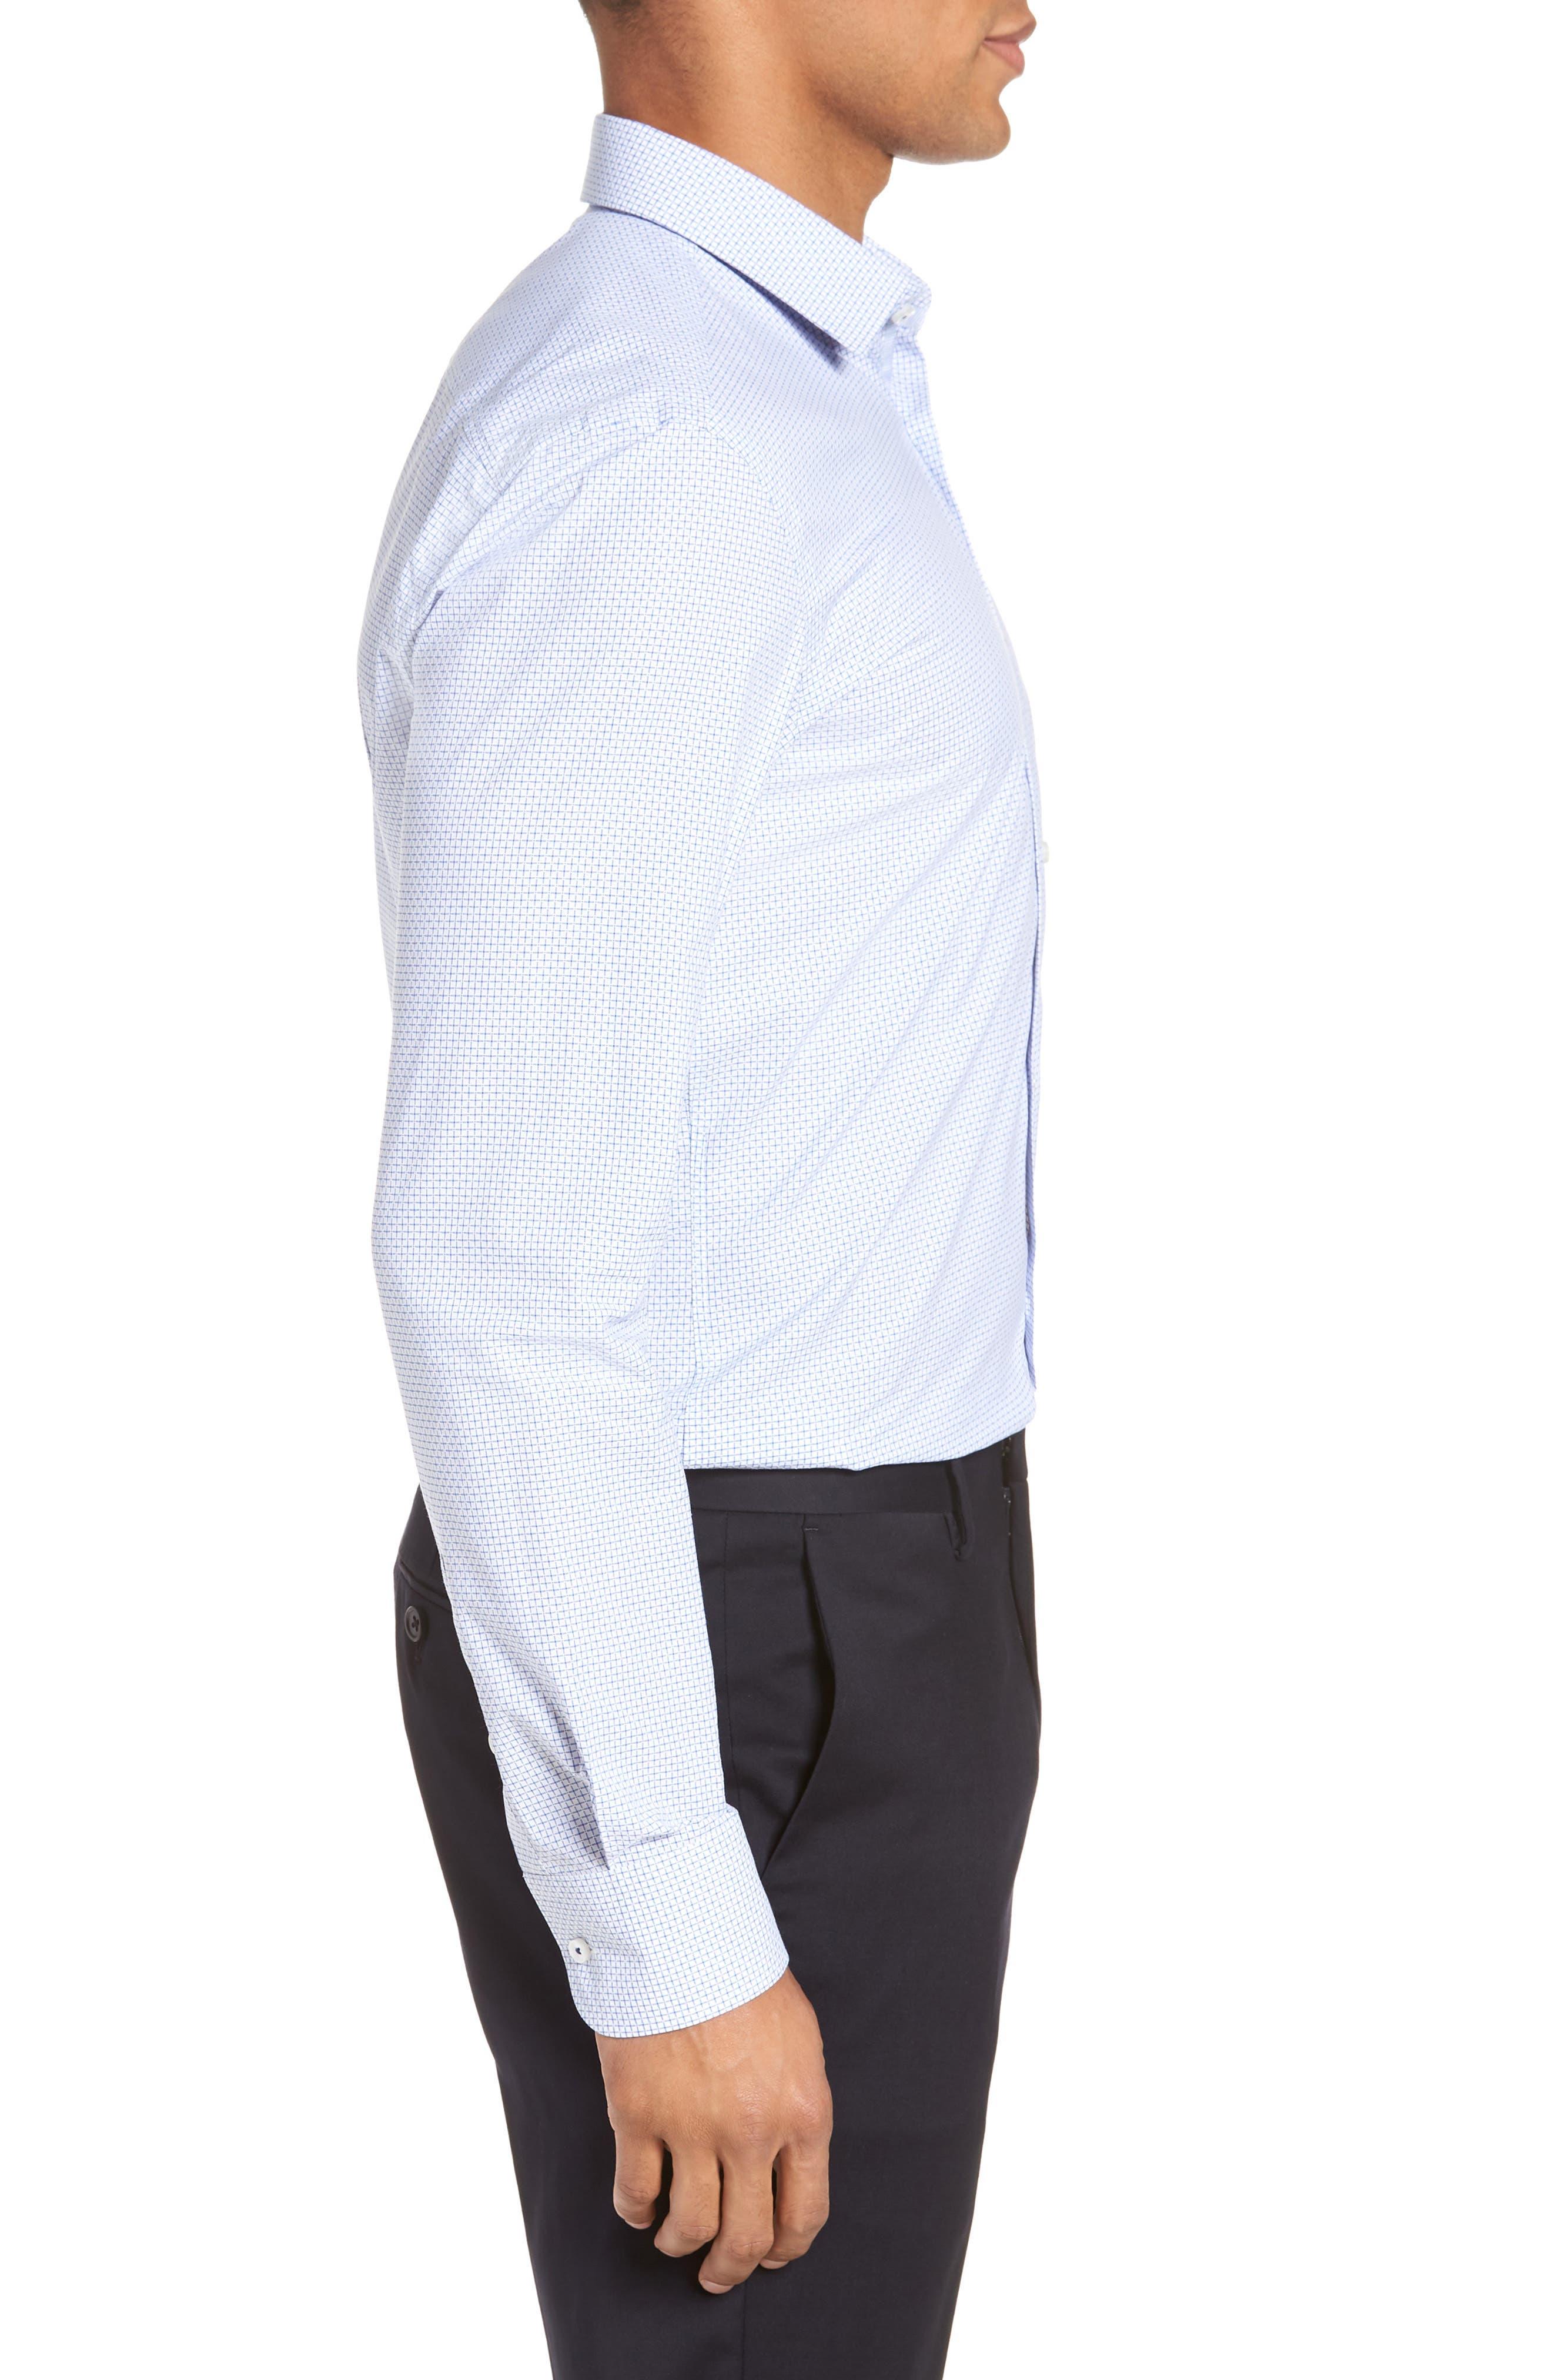 Jesse Slim Fit Check Dress Shirt,                             Alternate thumbnail 4, color,                             431